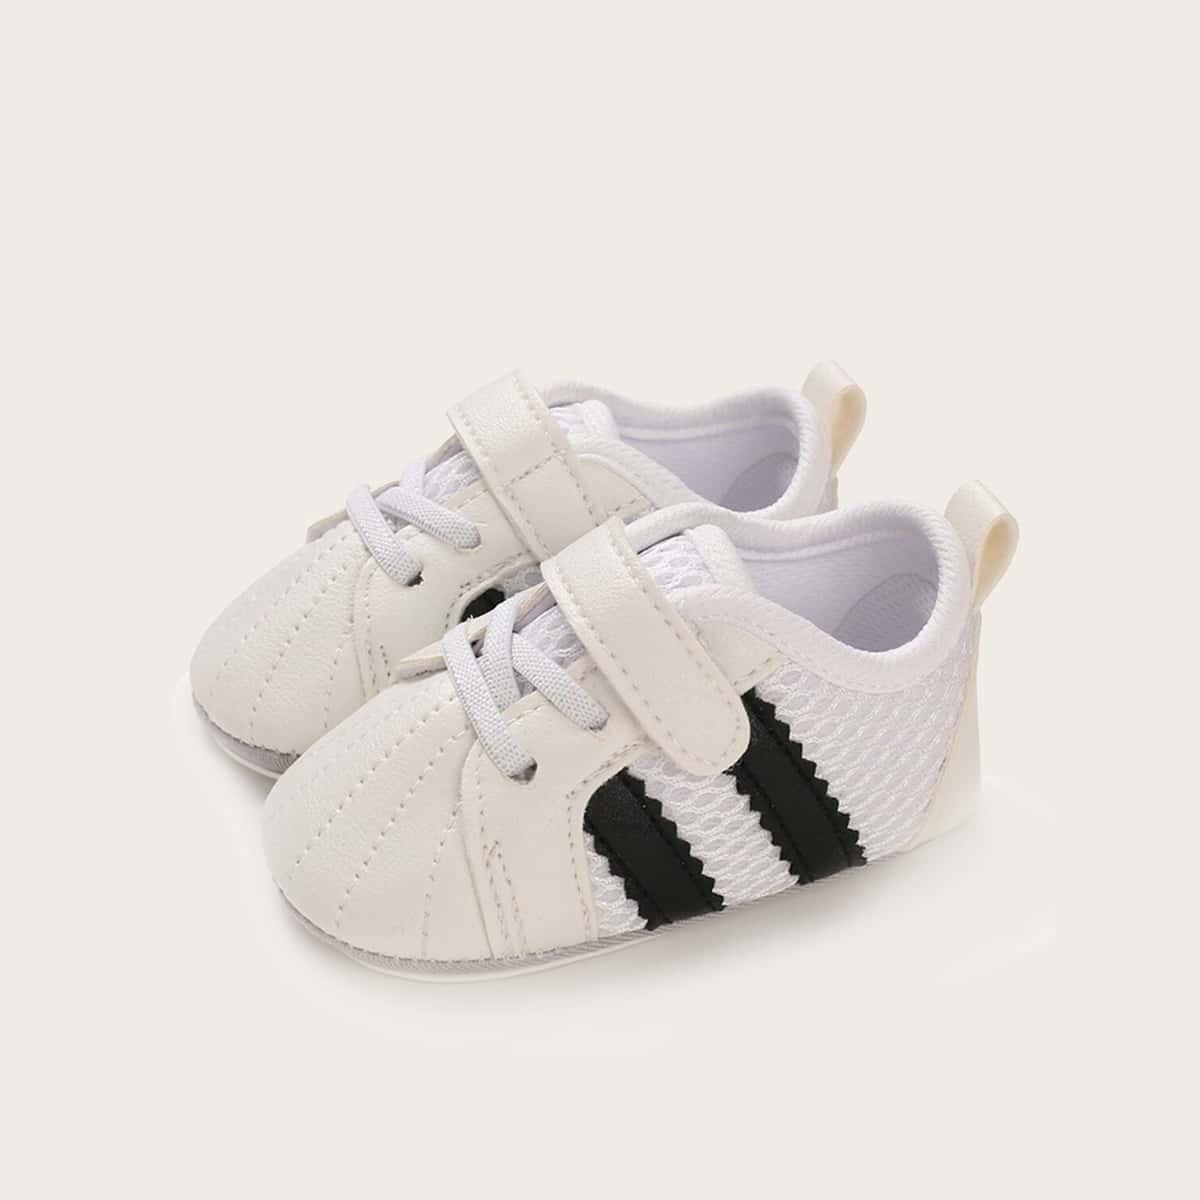 shein Gestreept Baby sneaker Kant